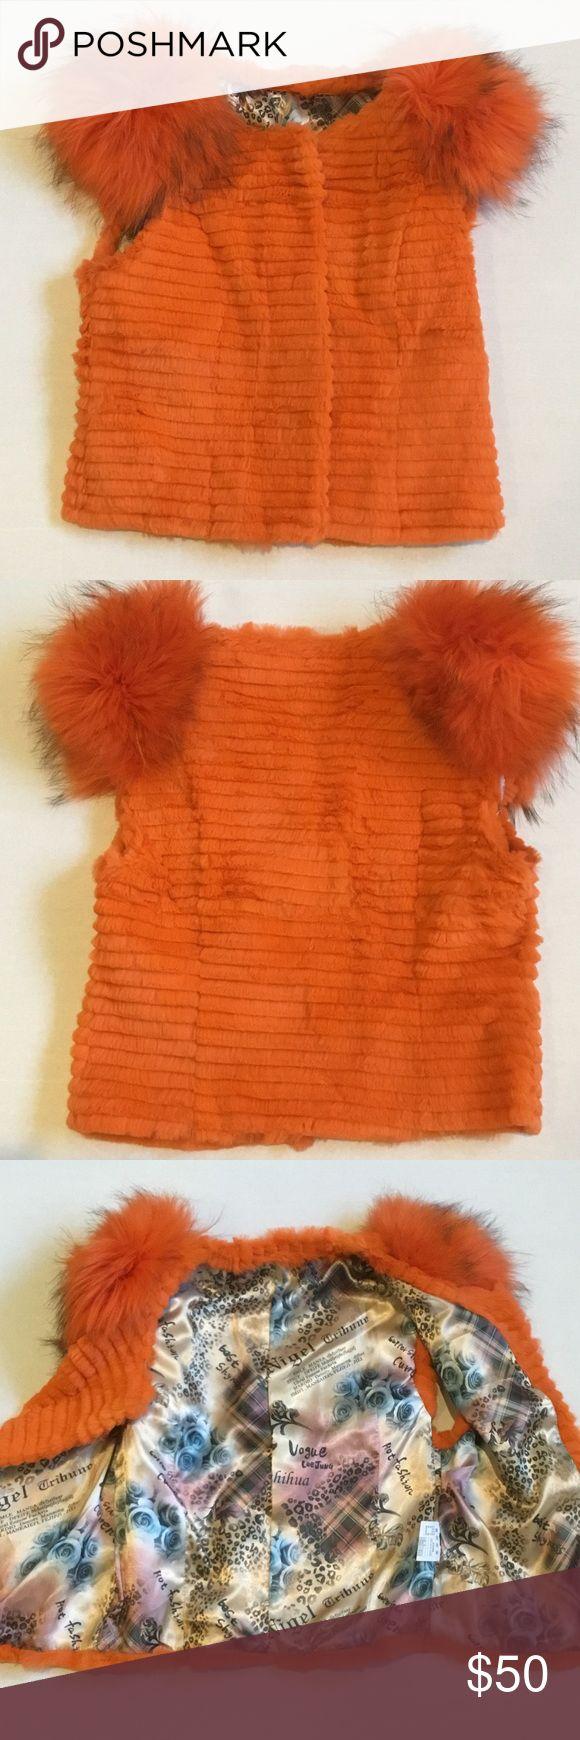 Orange rabbit fur vest with raccoon fur shoulders Orange sheared/trimmed rabbit fur vest with ombré or black streaked raccoon fur shoulders. Lined. Vintage. Super fun. Jackets & Coats Vests